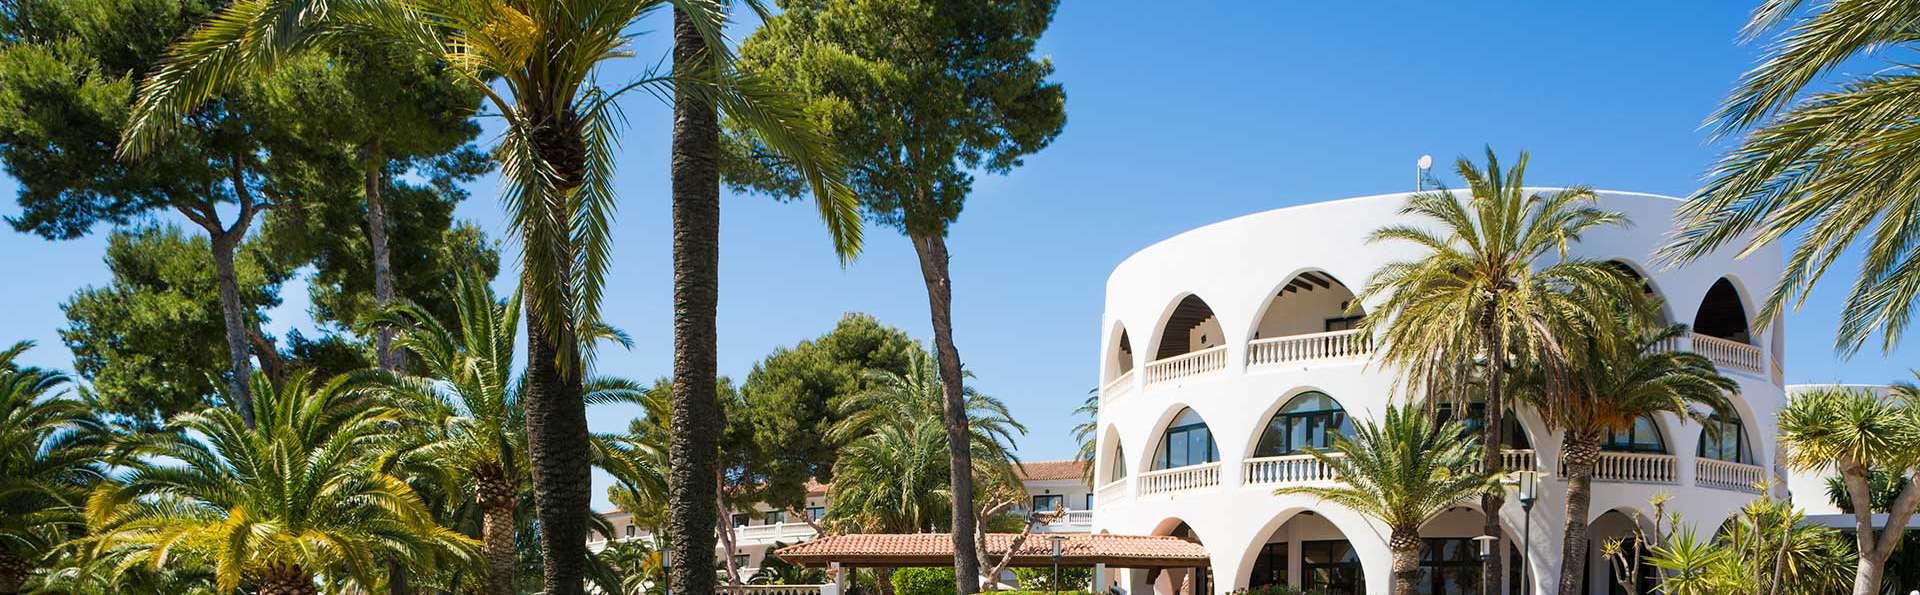 Maritim Hotel Galatzó - EDIT_FRONT_02.jpg